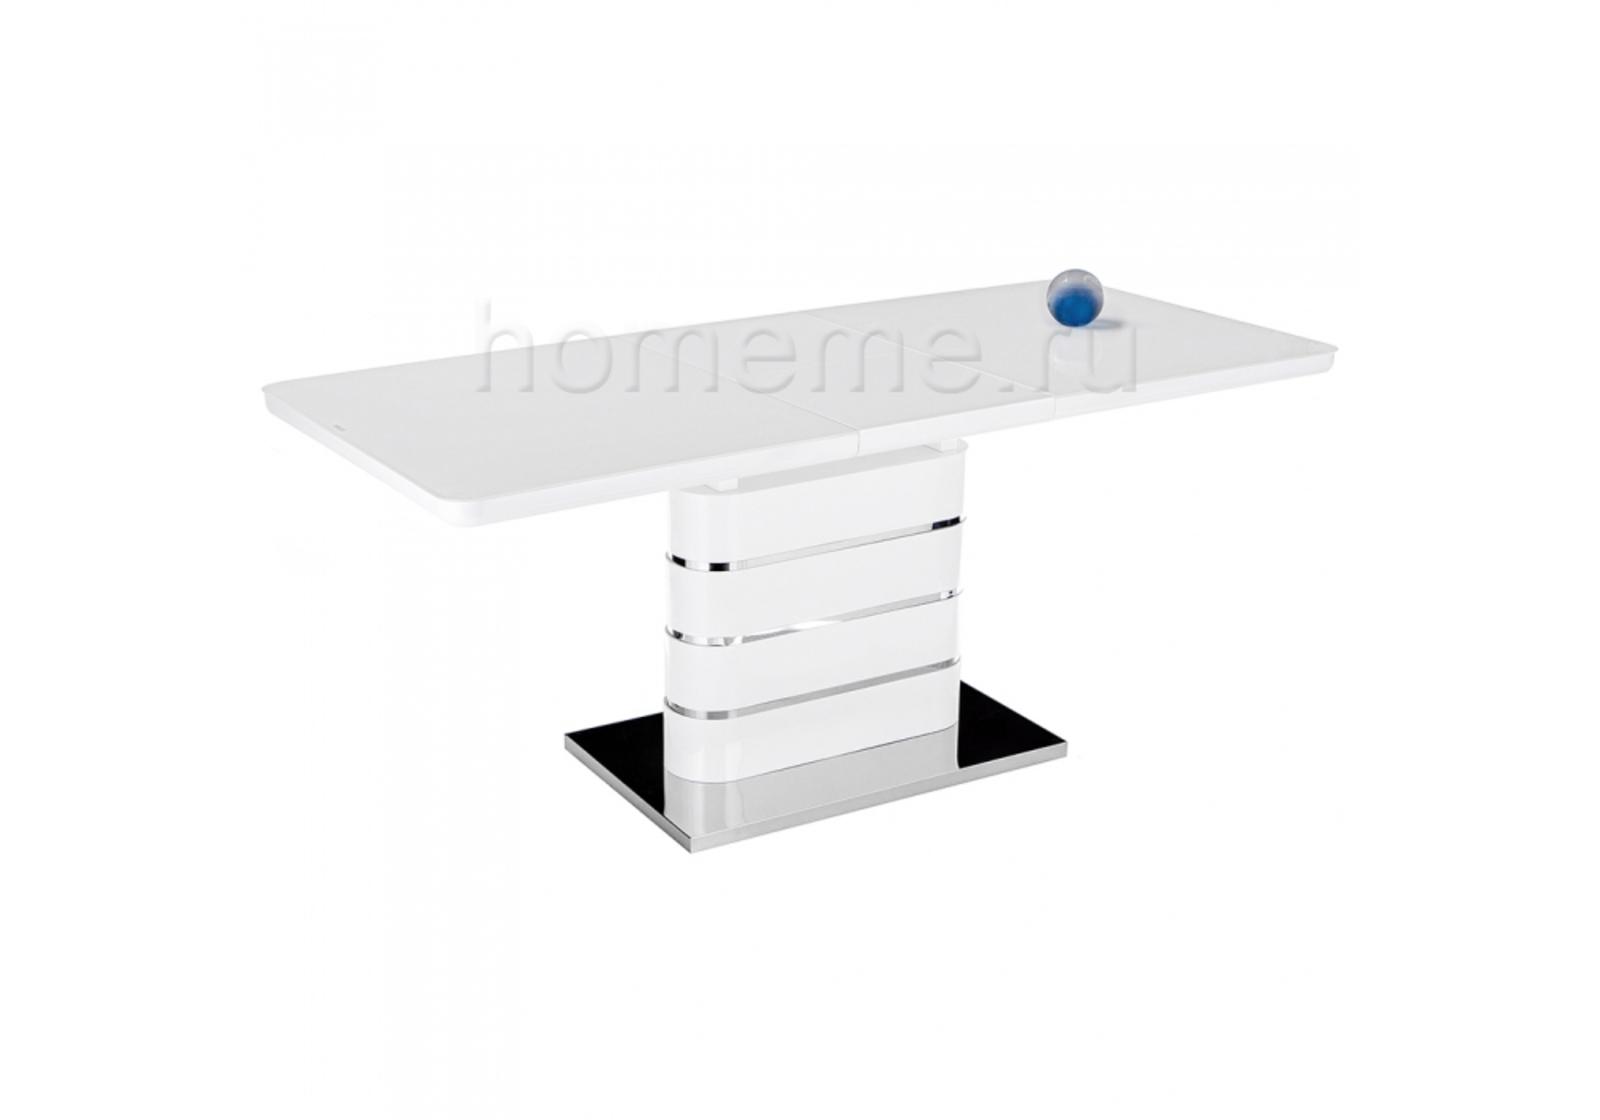 Стол стеклянный Plas 160 super white 11163 Plas 160 super white 11163 (14447)